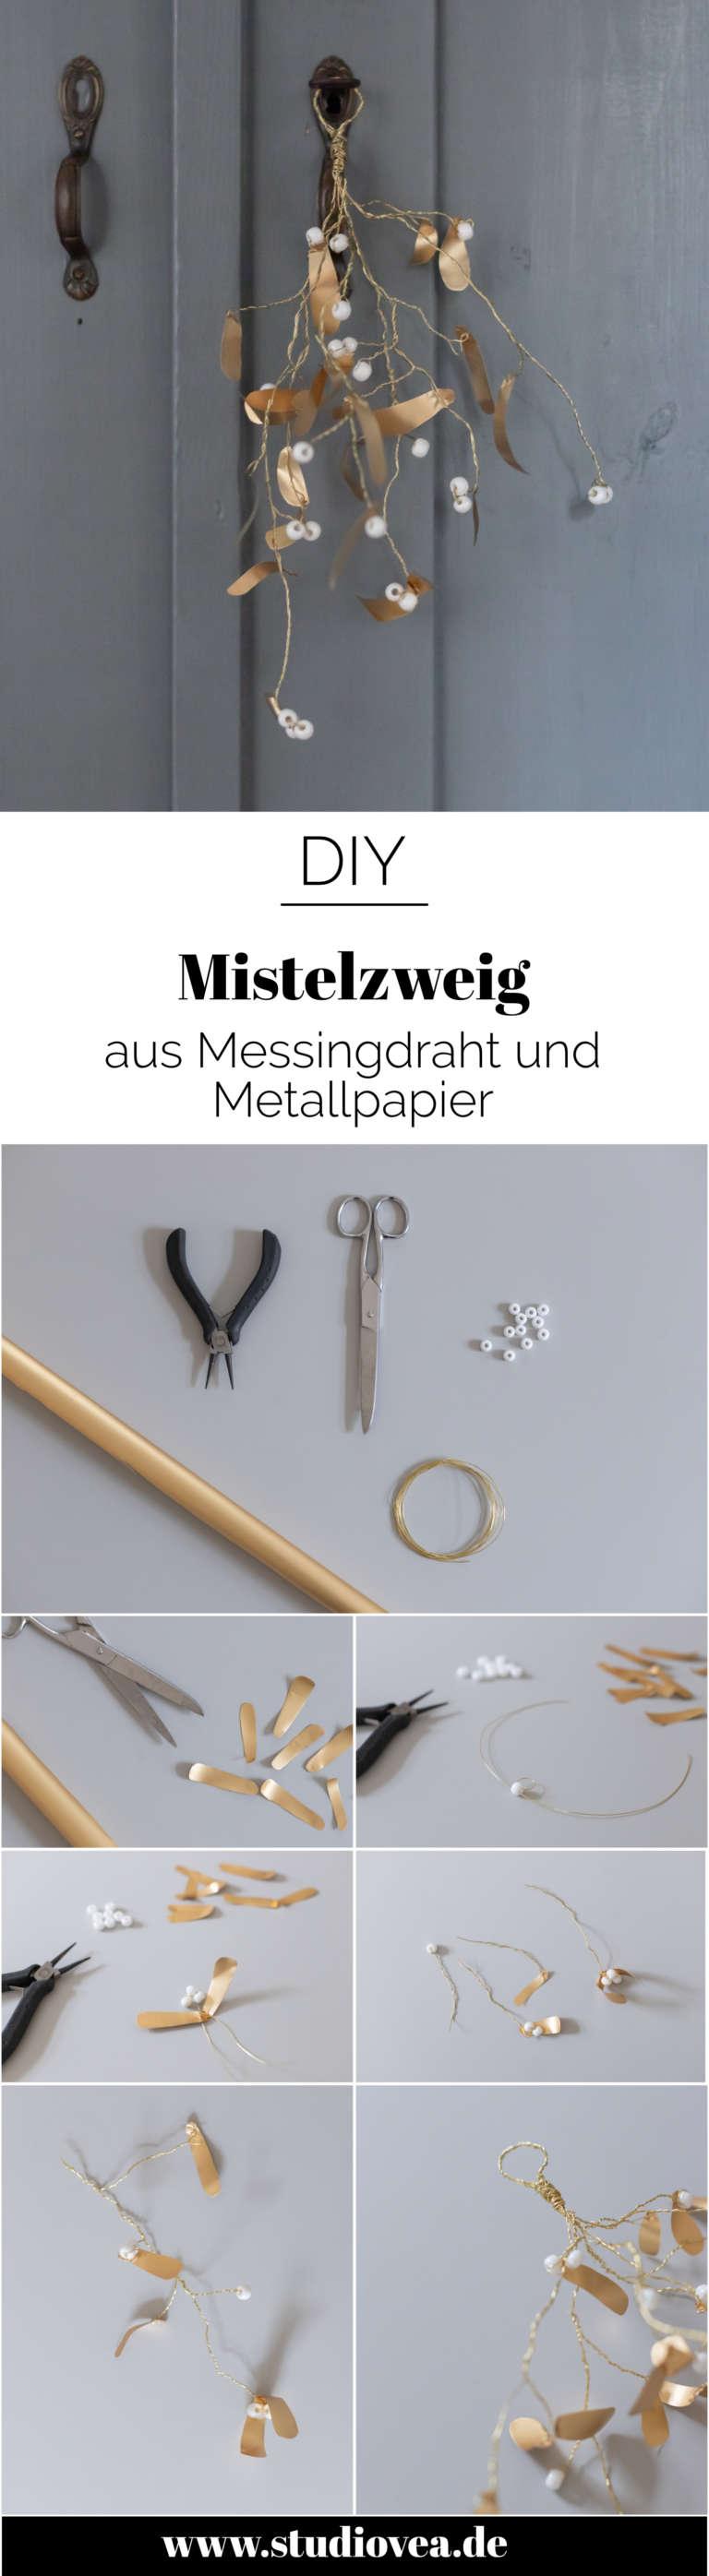 Anleitung DIY Mistelzweig